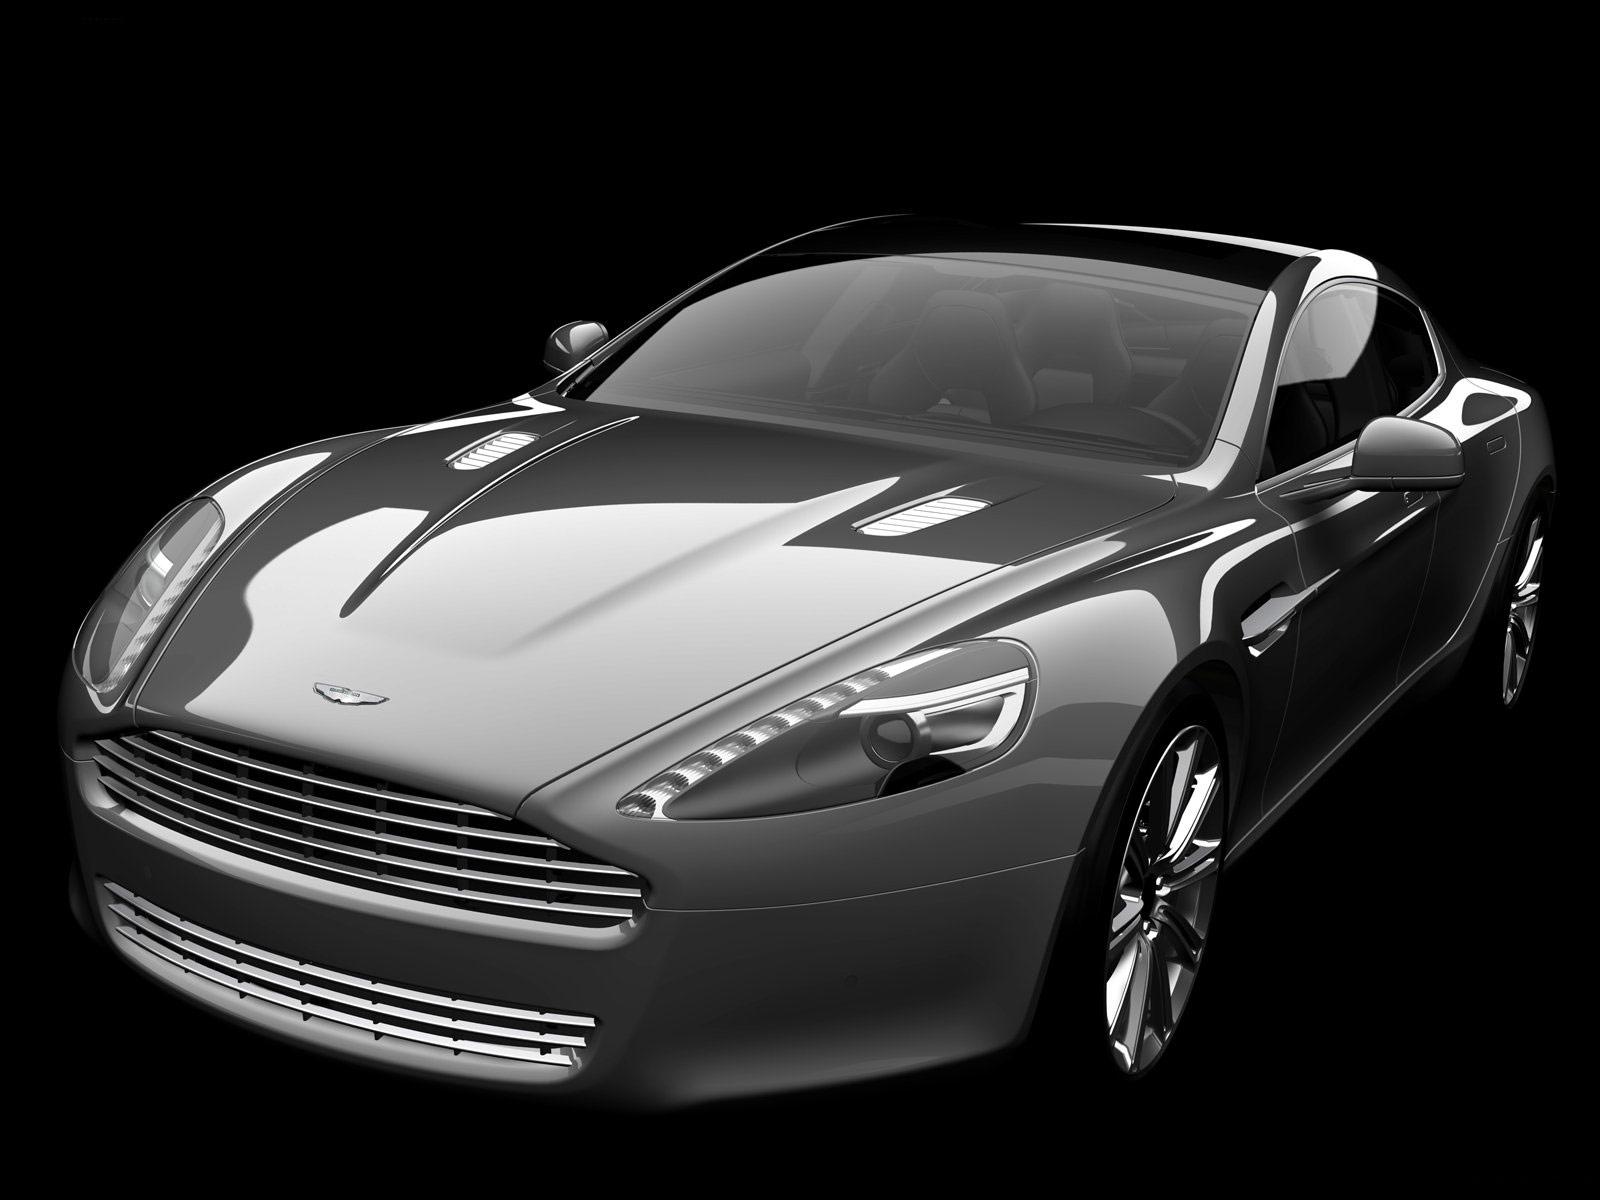 Wallpaper Mobil Sport Aston Martin: Gambar Mobil ASTON MARTIN Rapide